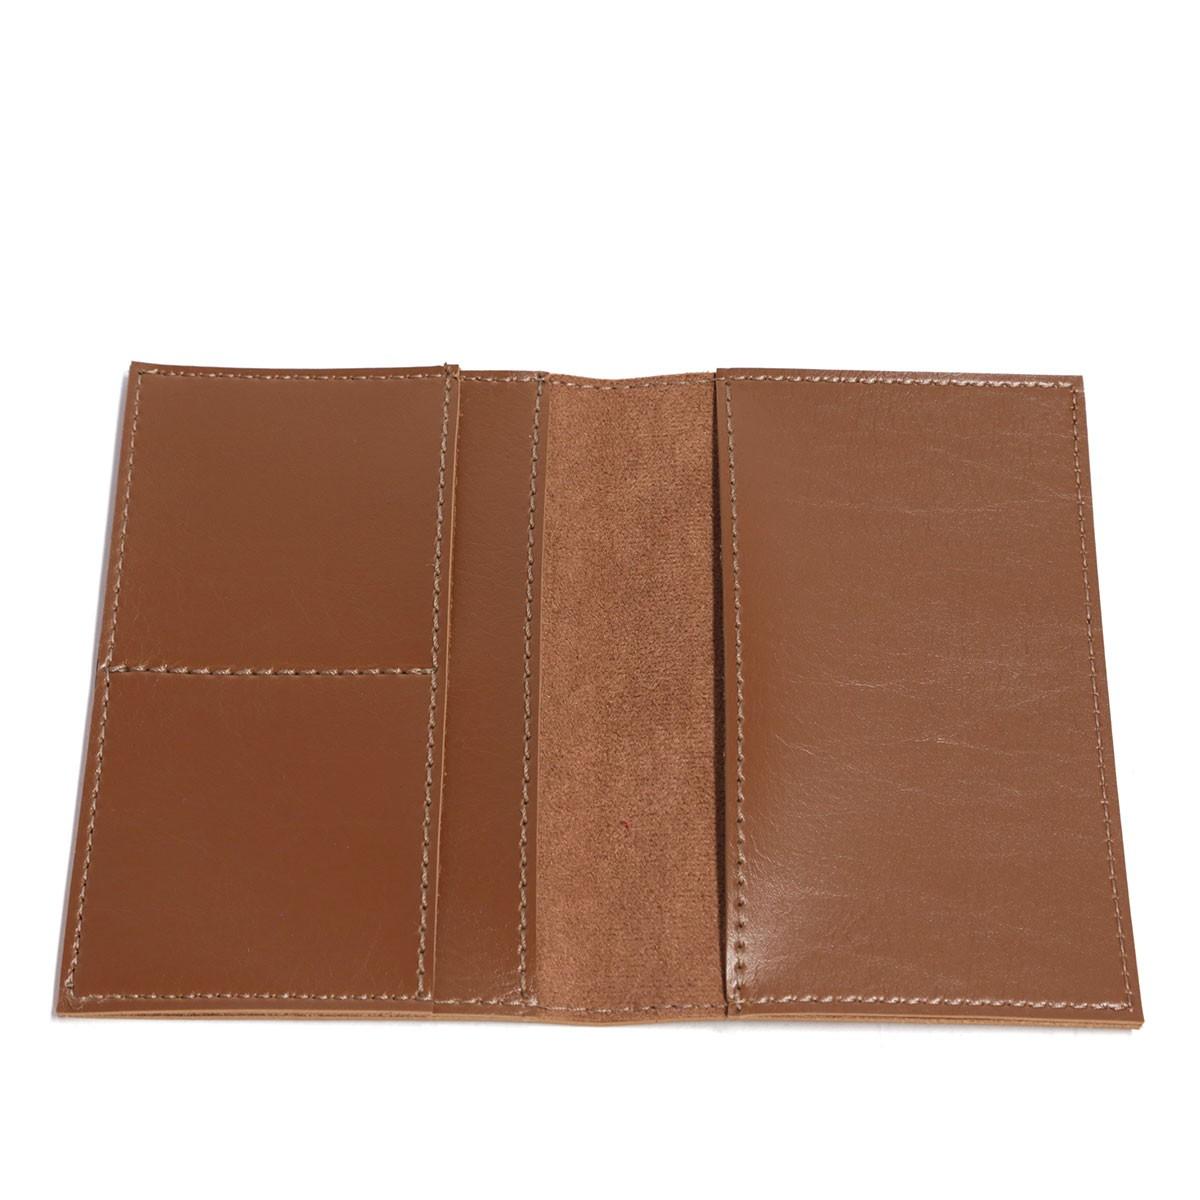 Porta passaporte com bolso (Montana Havana)